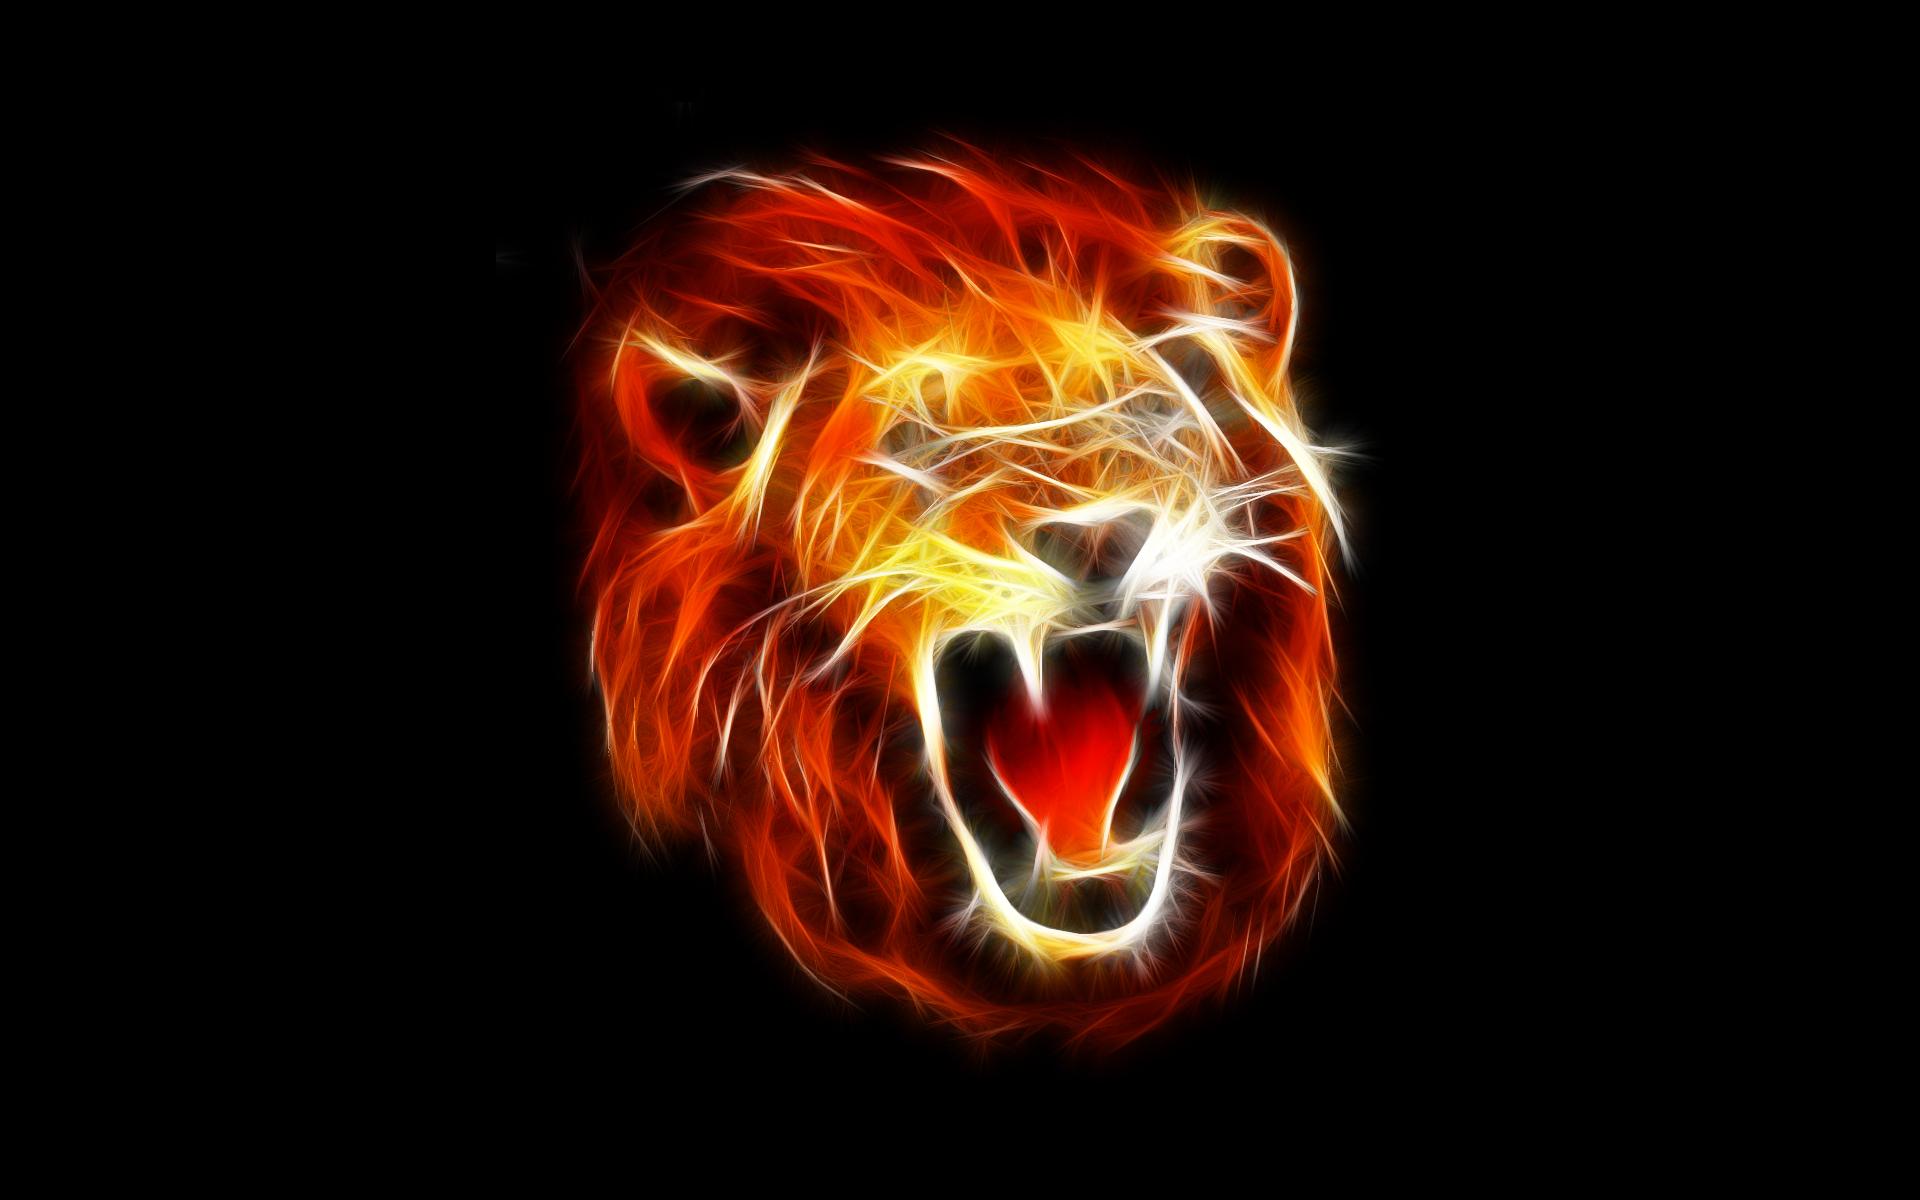 Hd Lion Pictures Lions Wallpapers: Roaring Lion Wallpaper